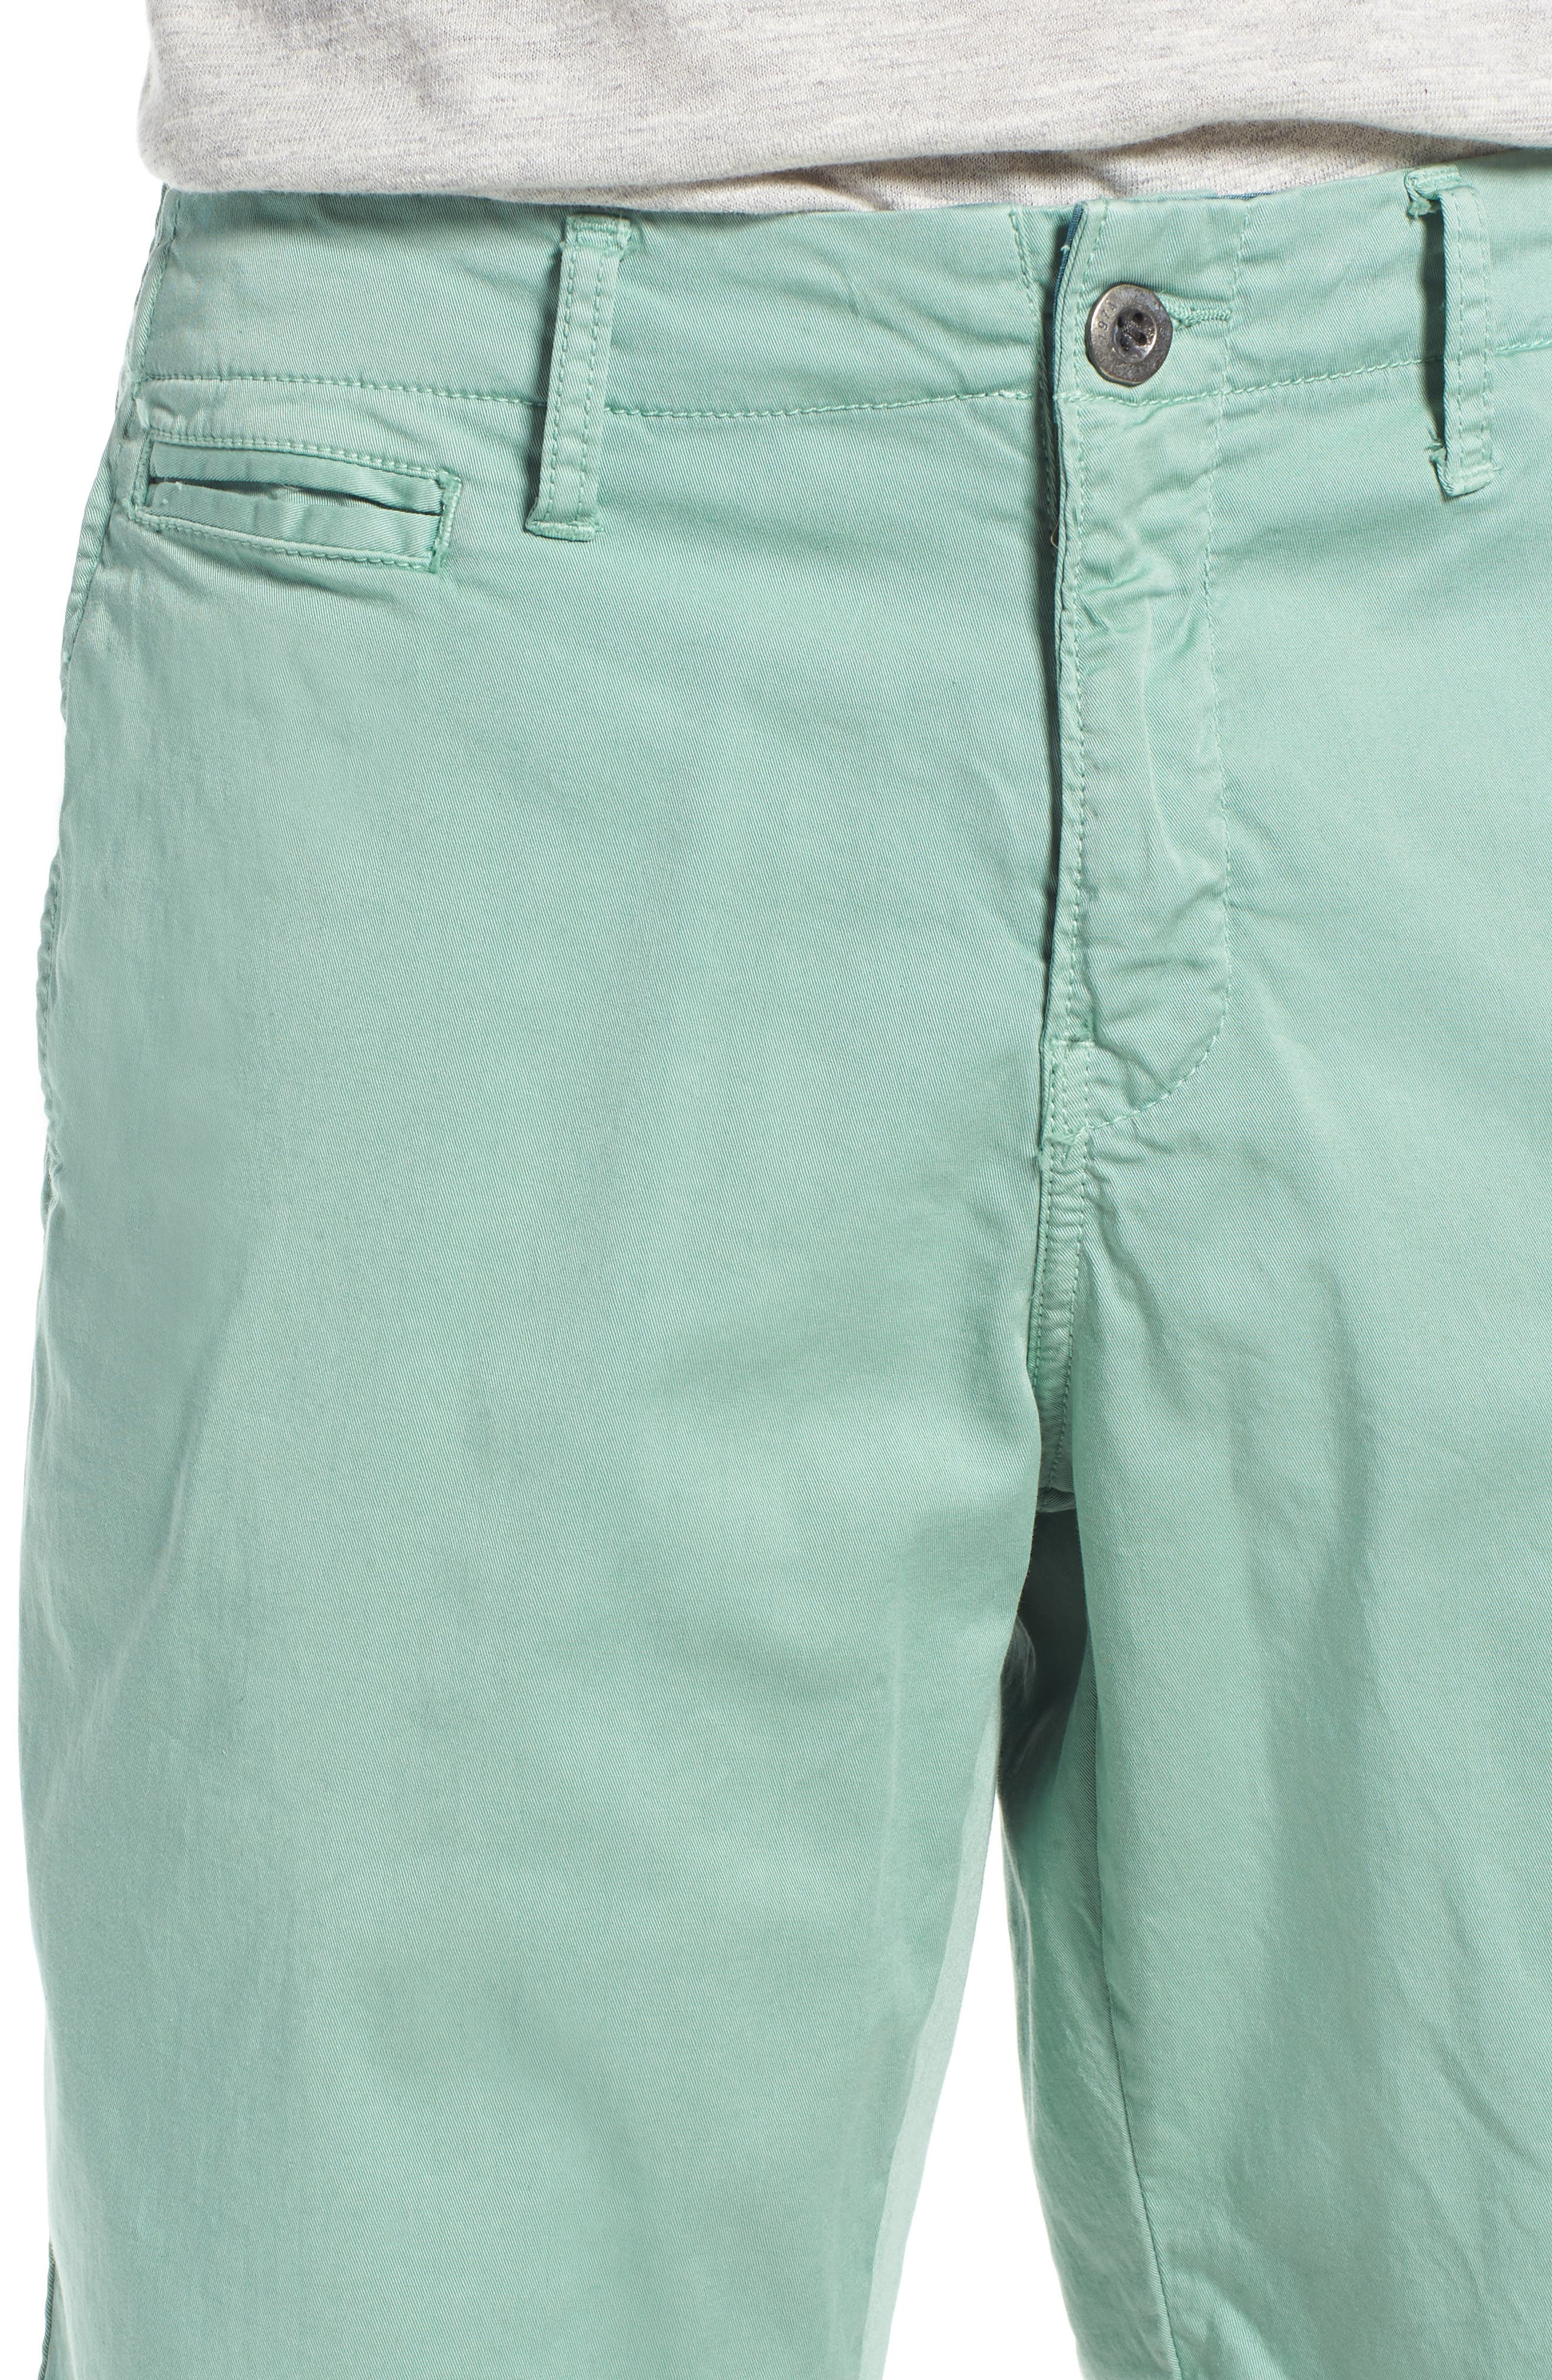 St. Barts Twill Shorts,                             Alternate thumbnail 43, color,